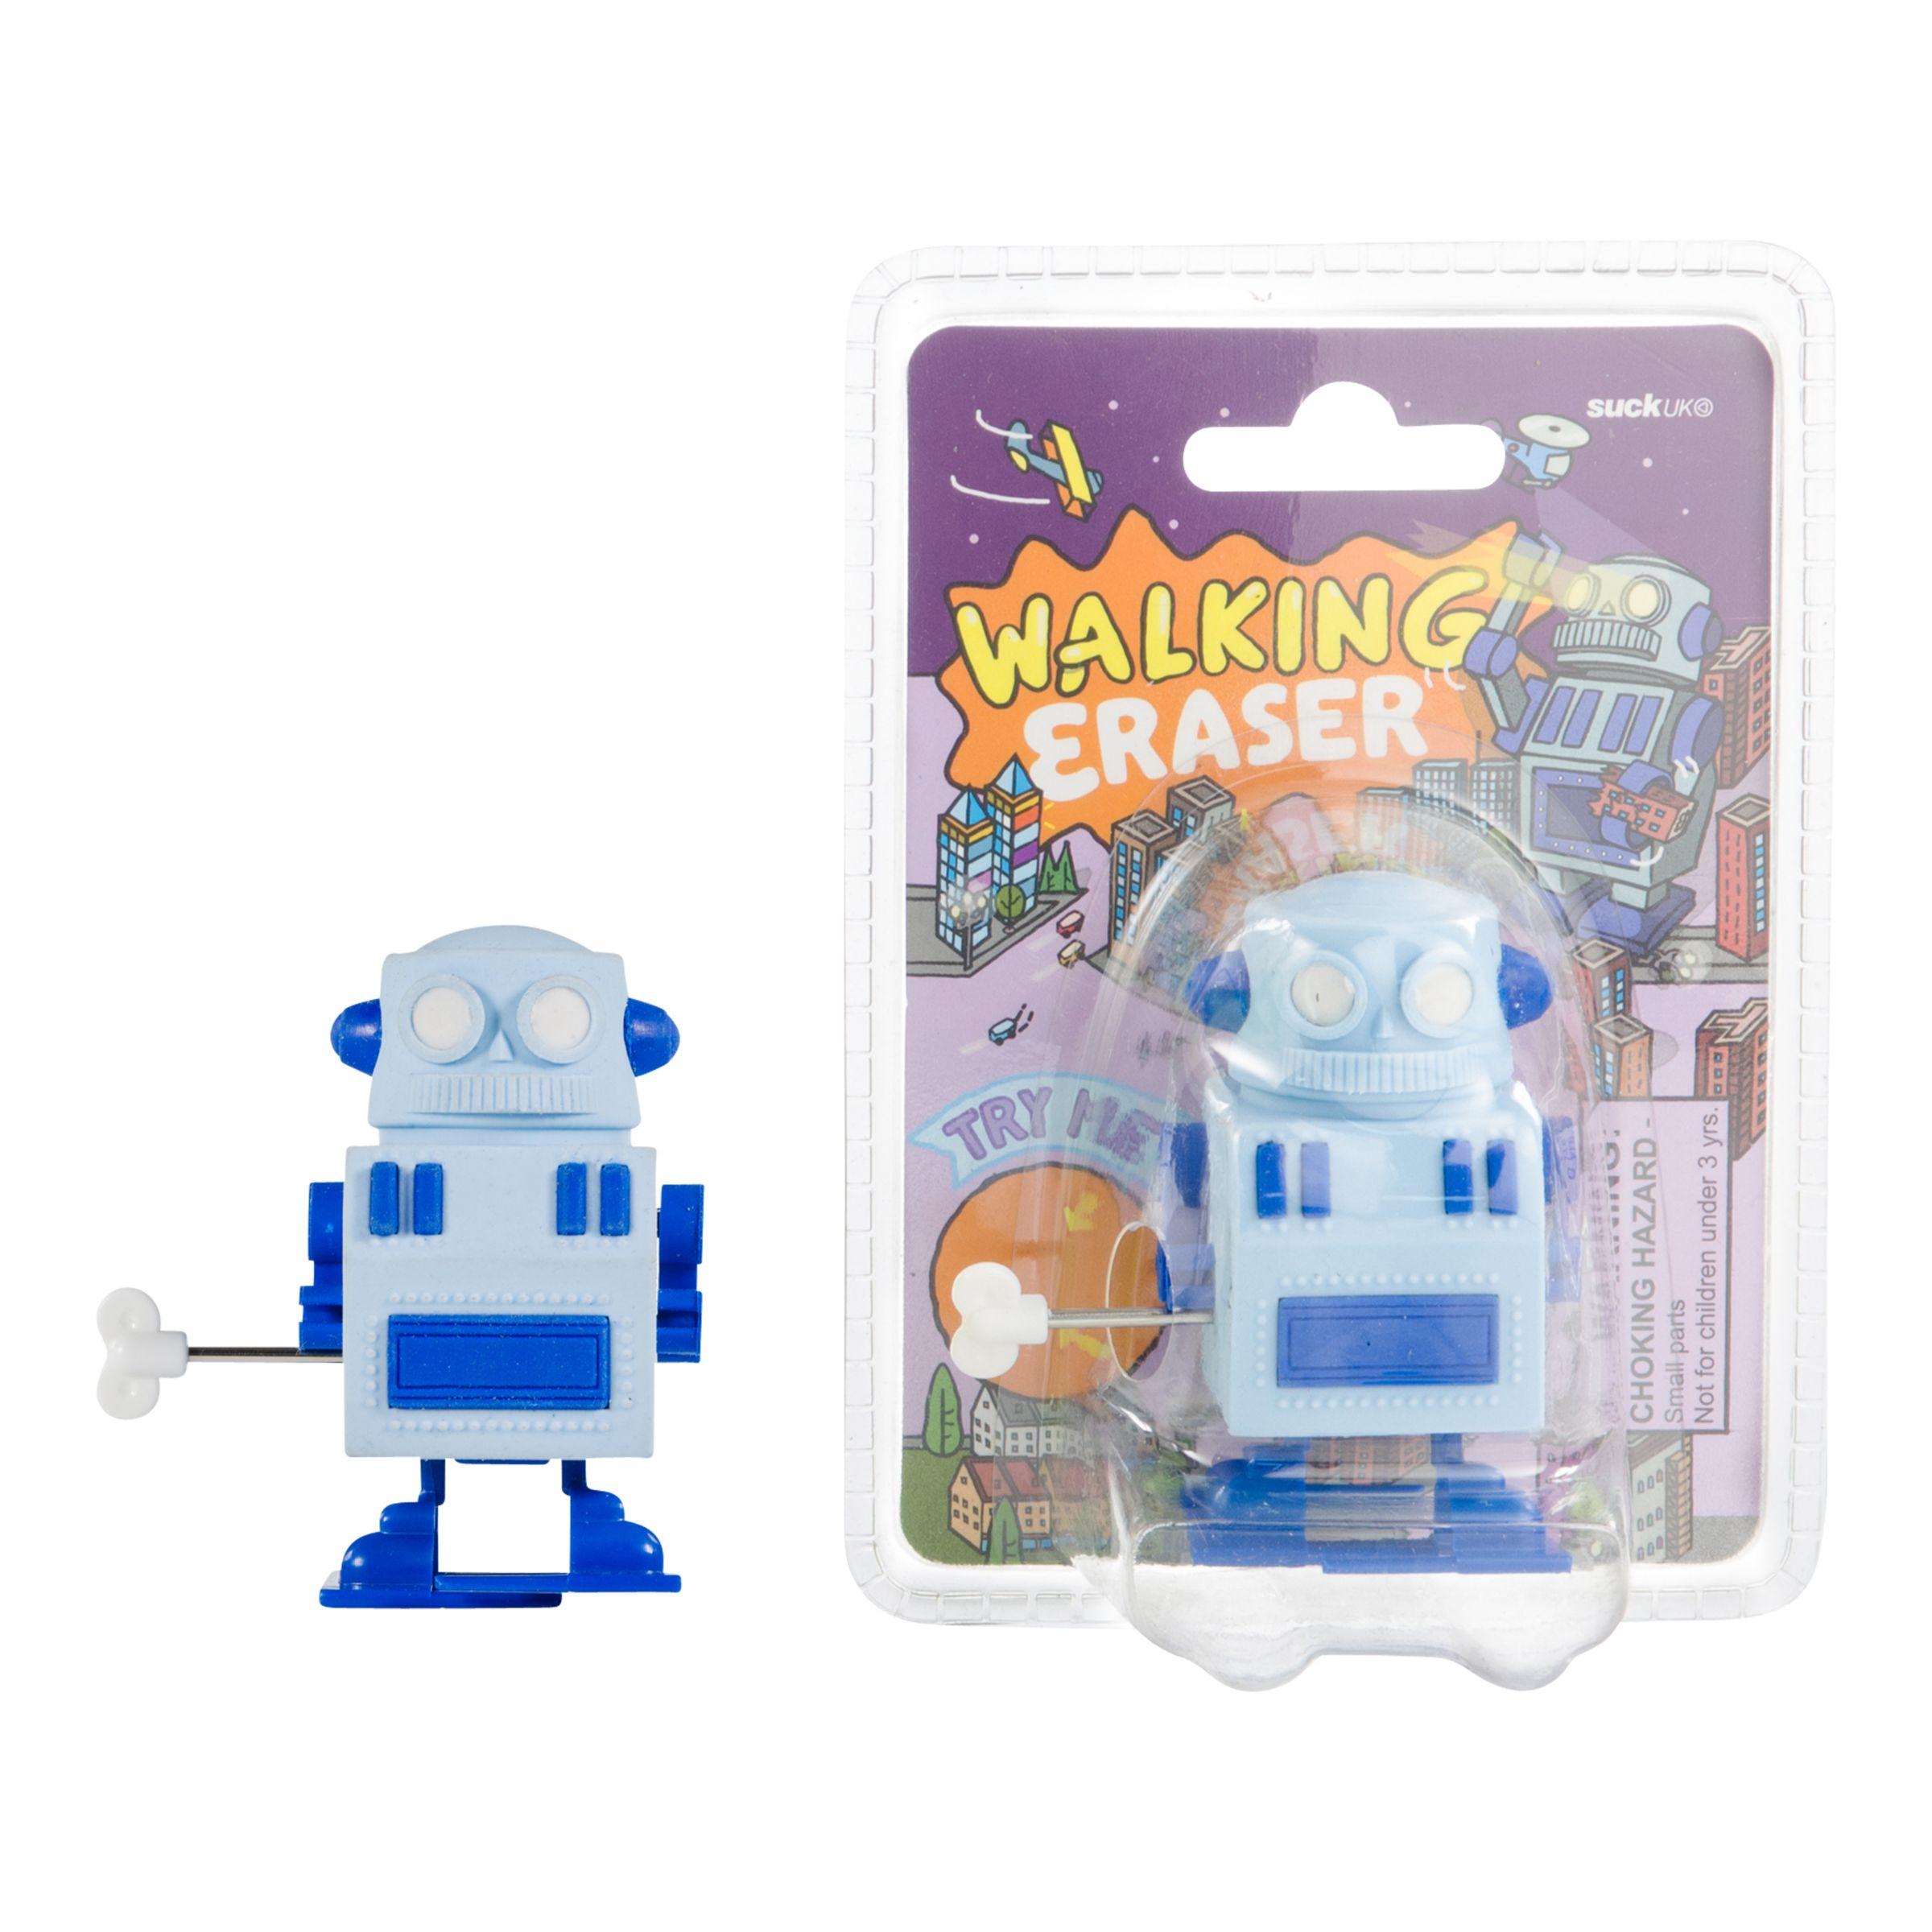 Suck UK Suck UK Walking Robot Eraser